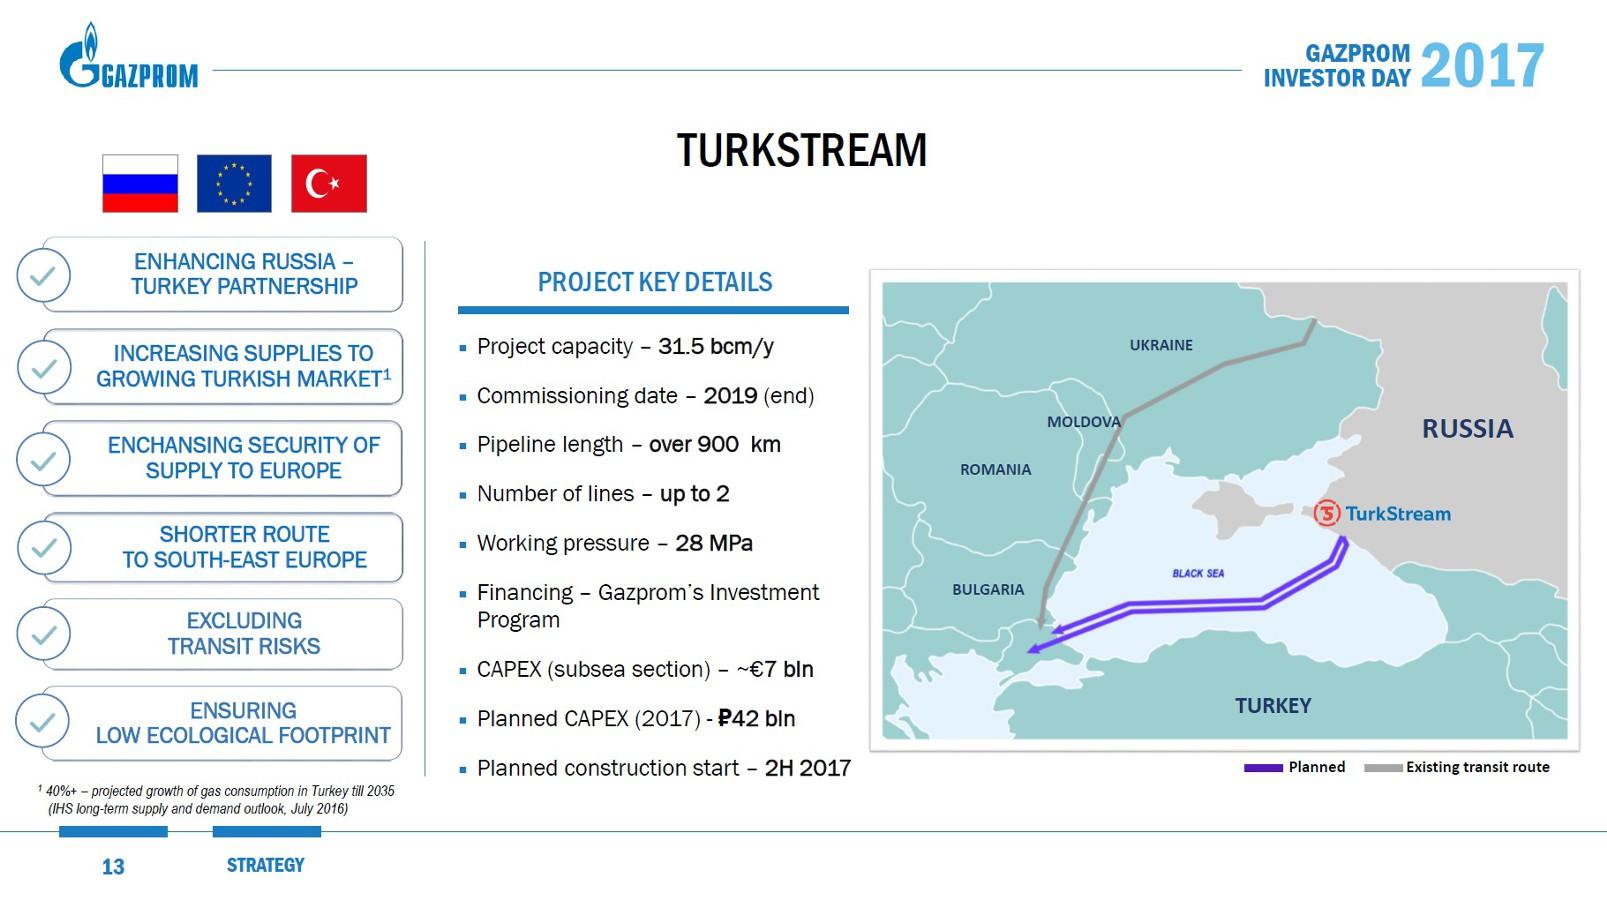 Схема маршрута турецкого потока